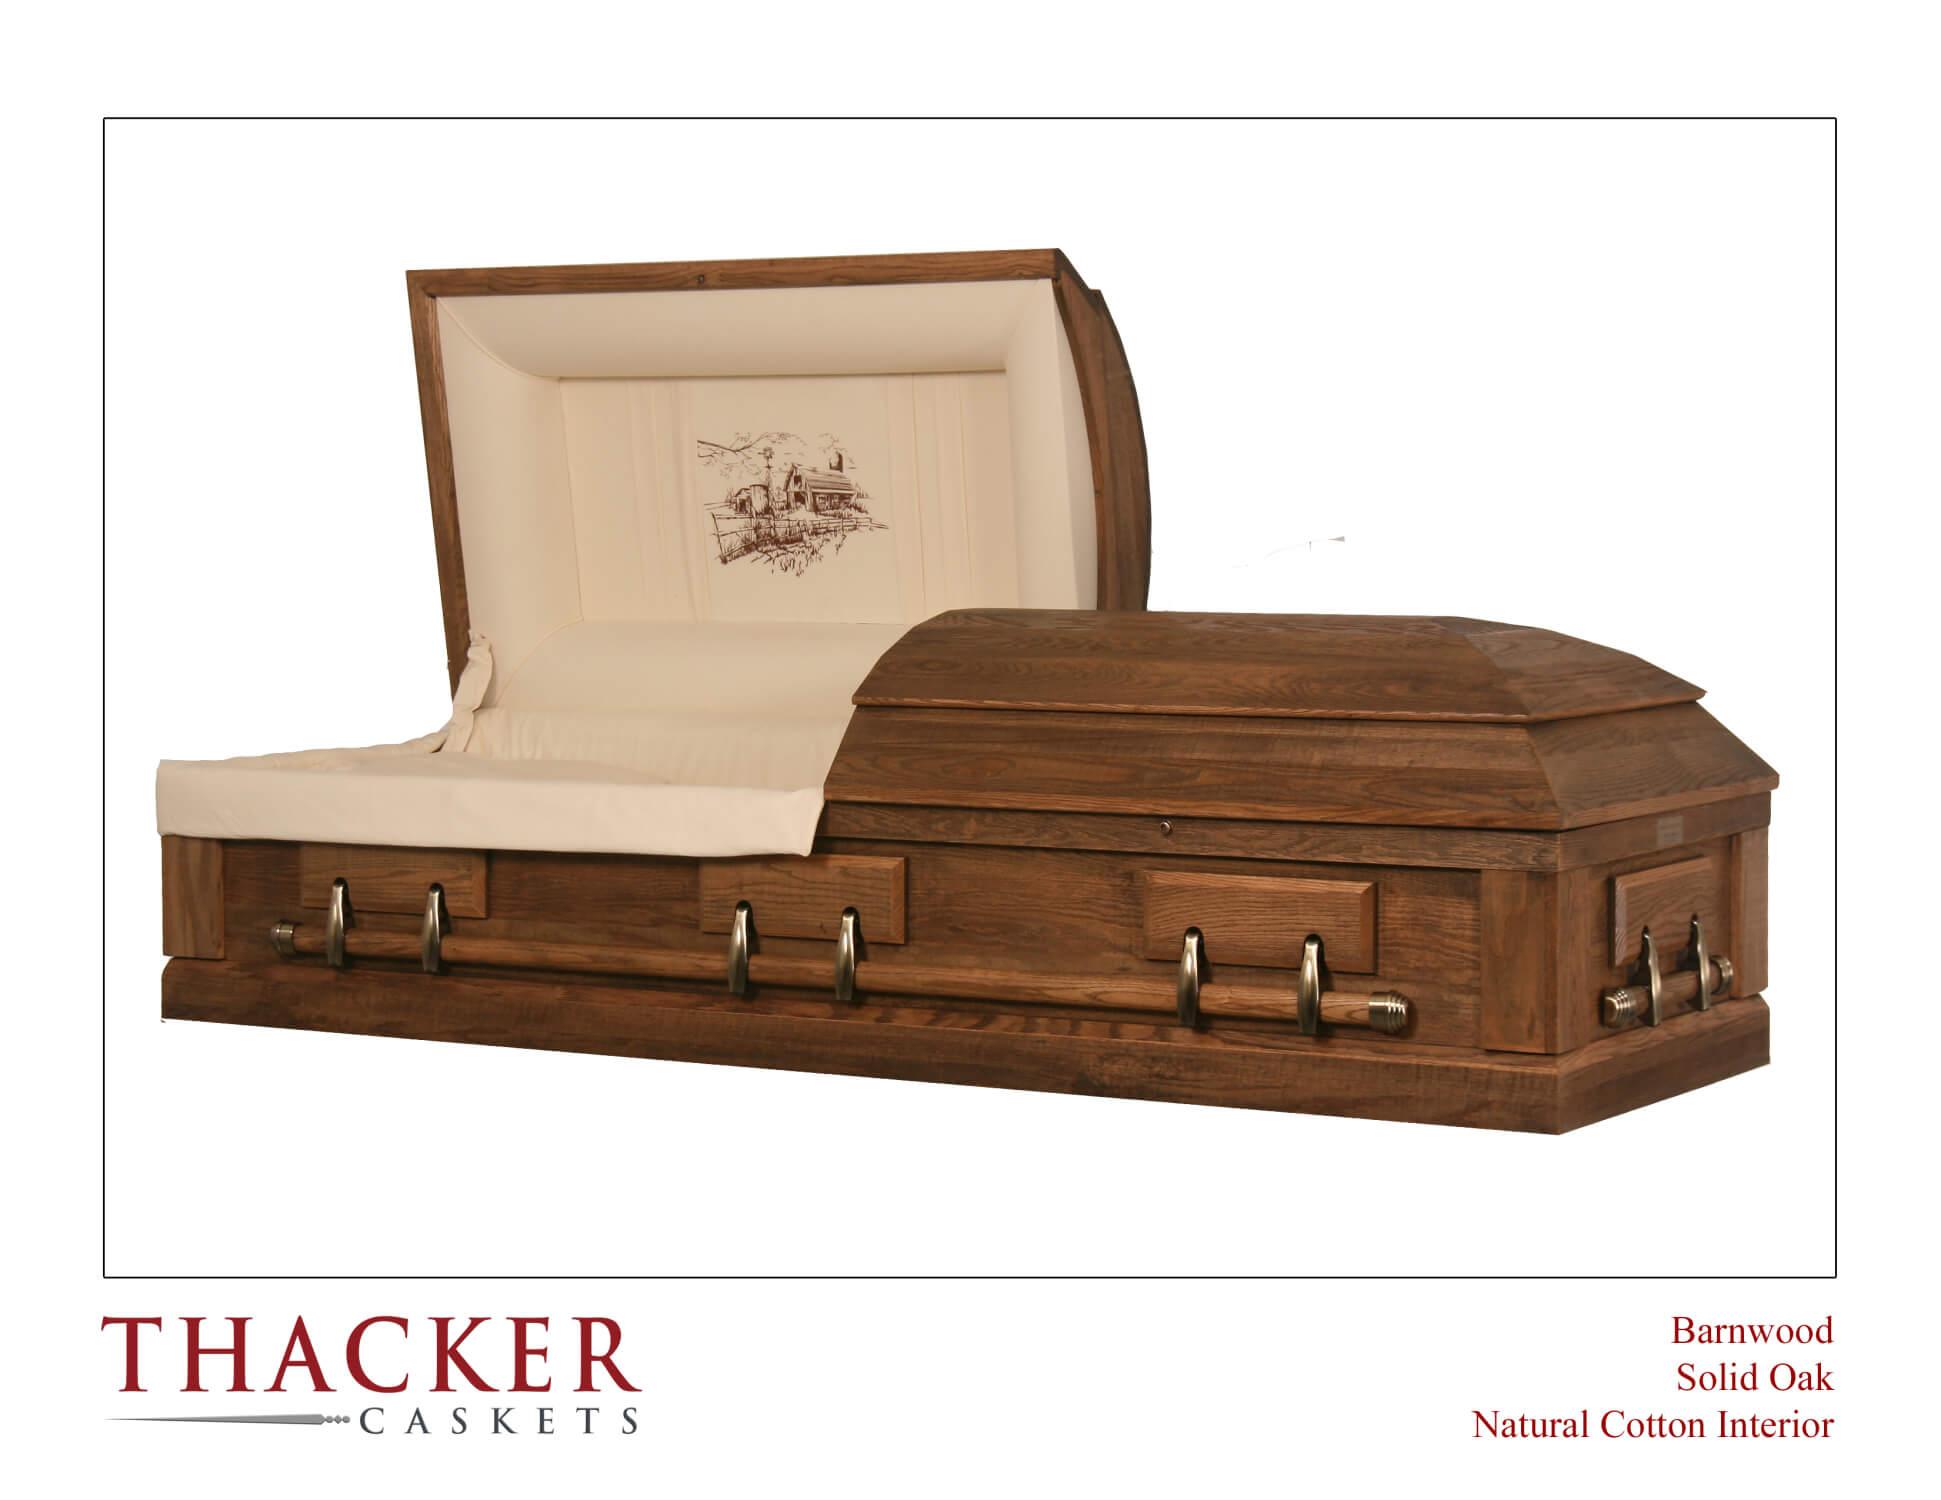 Barnwood Syle Solid Oak Casket - $2,395.00